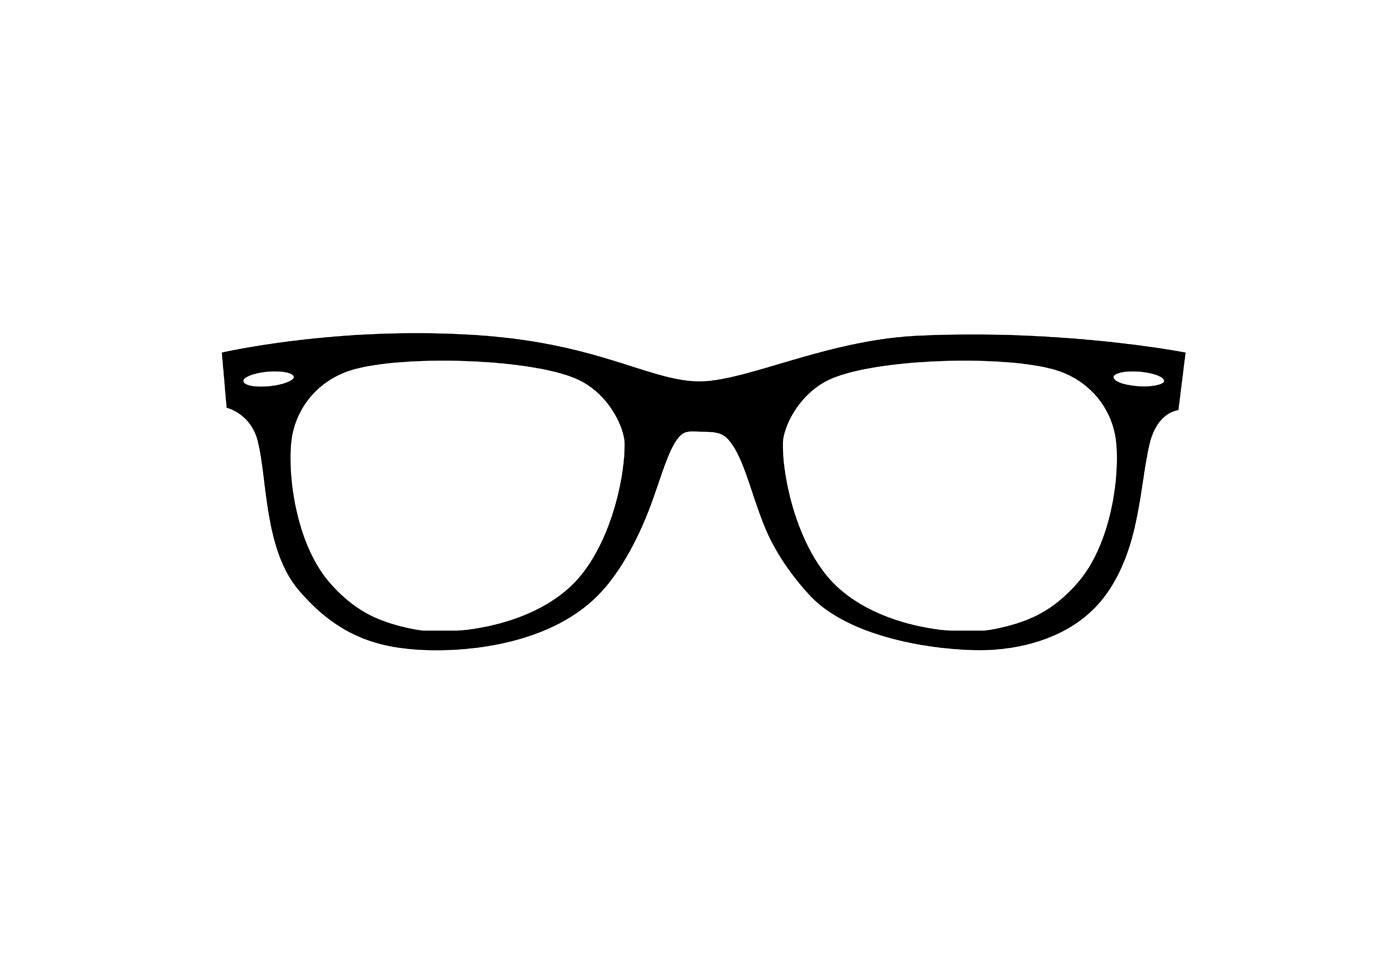 91971b258509 Free Ray Ban Glasses Vector « Heritage Malta